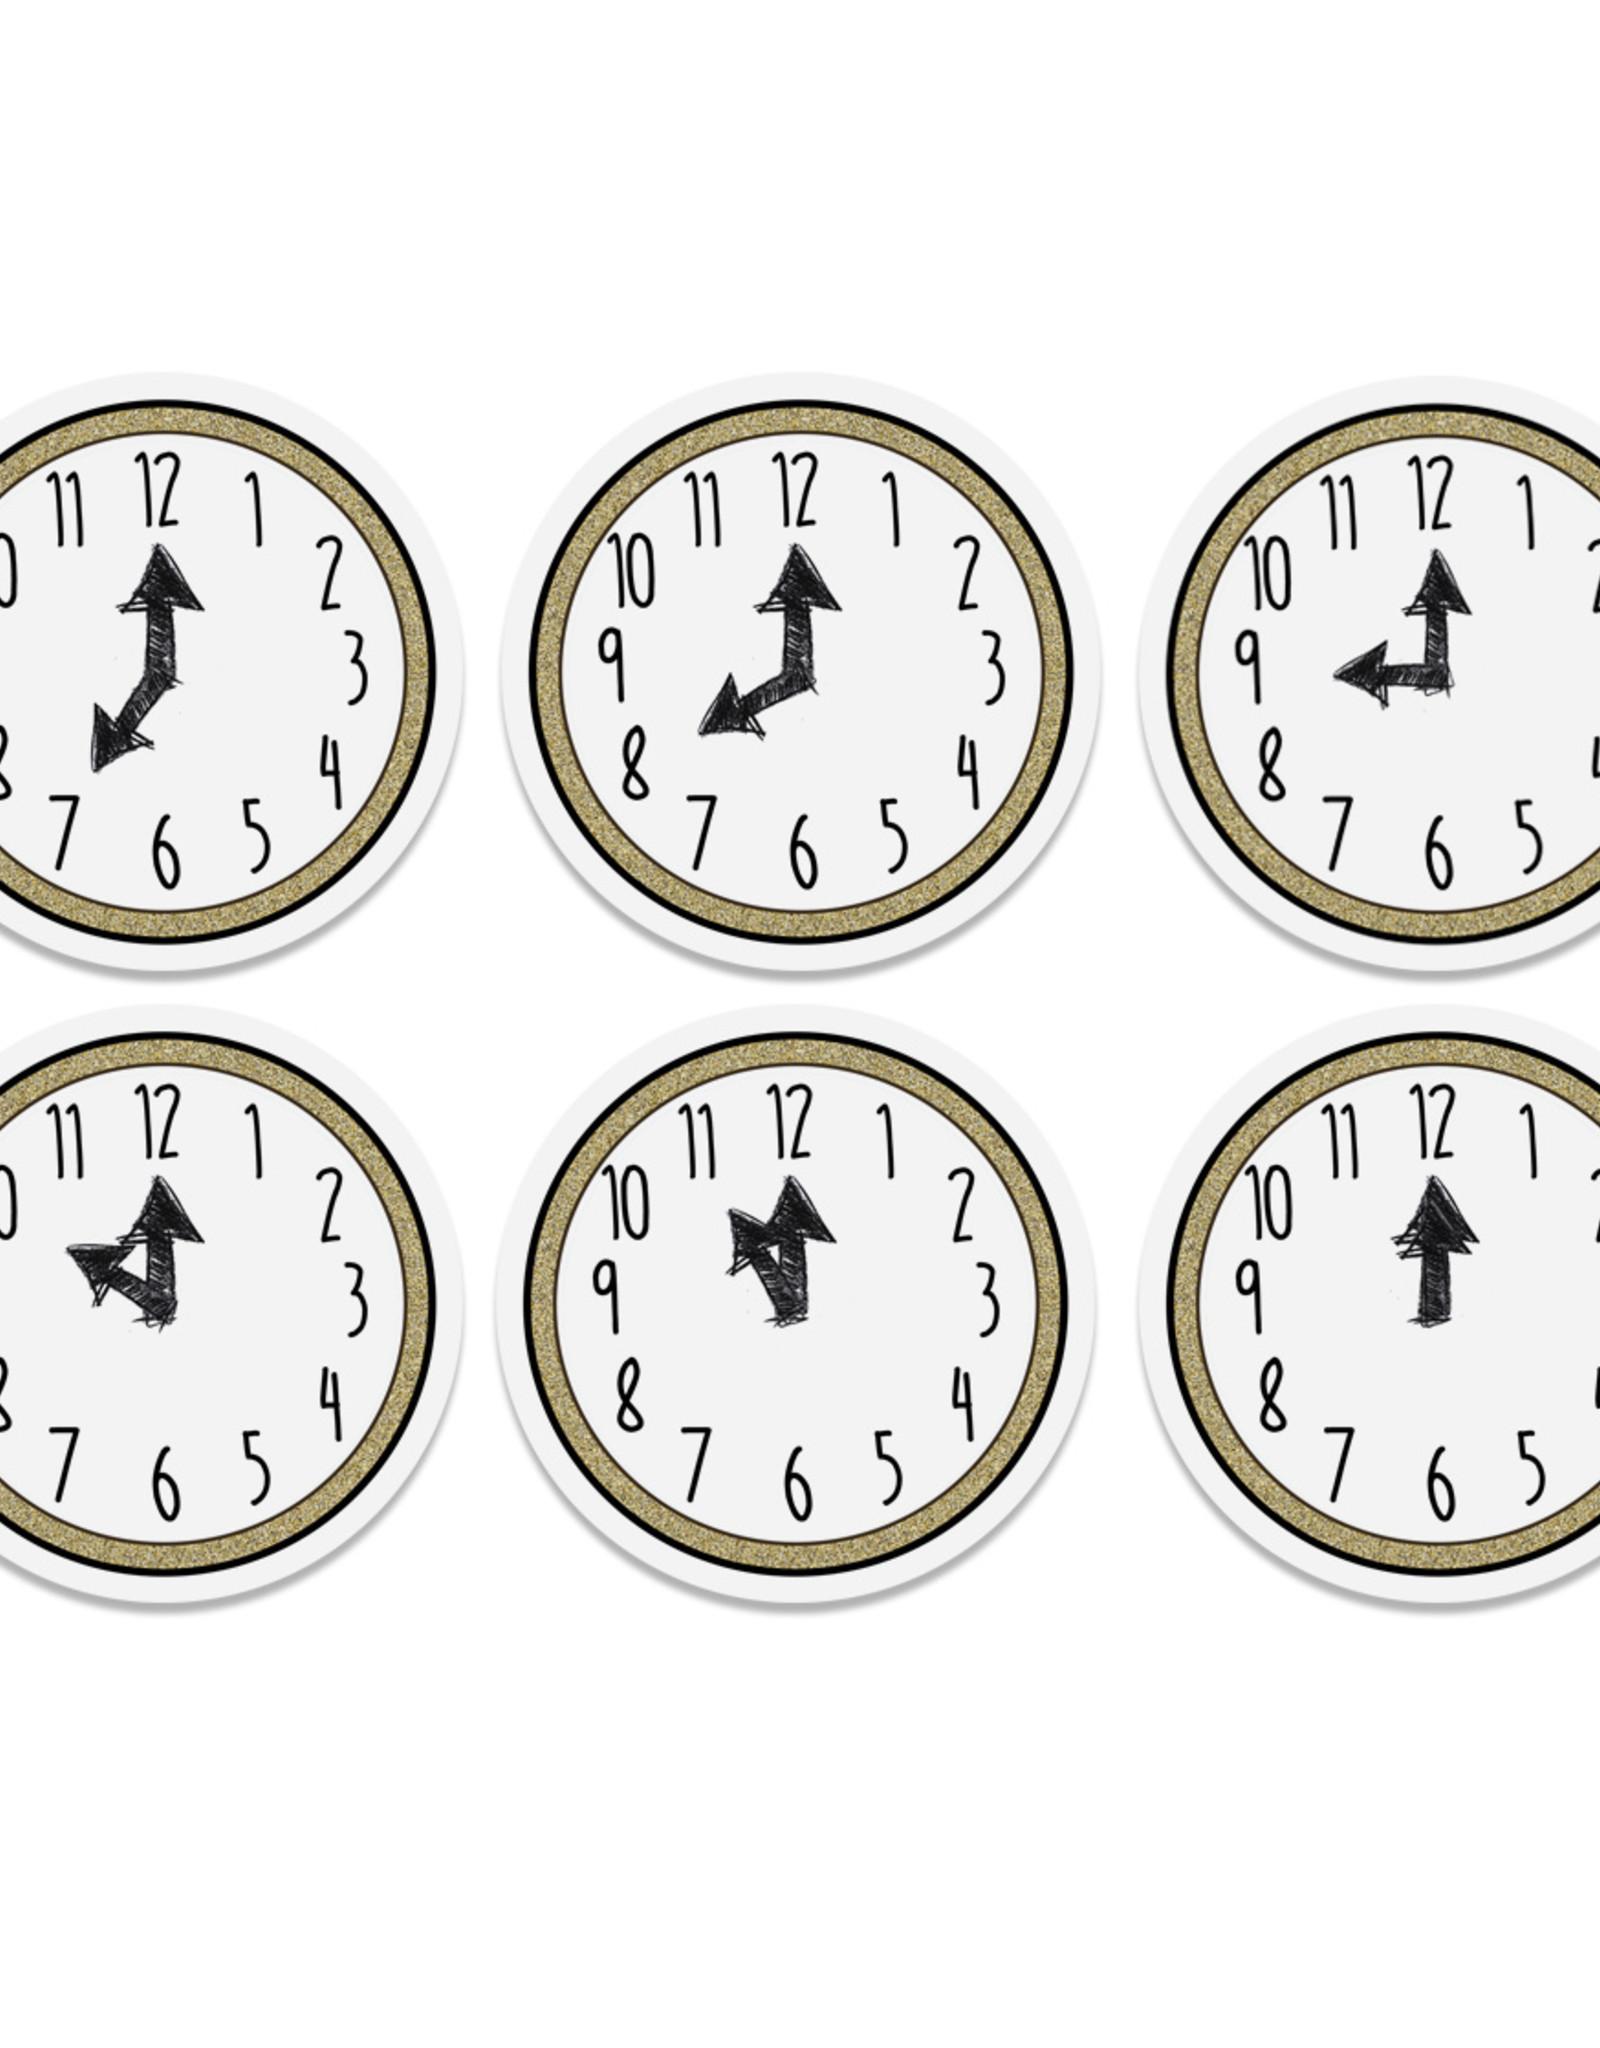 Silvester Countdown Tüten inkl. 6 Sticker Silvesterspiel für Kinder